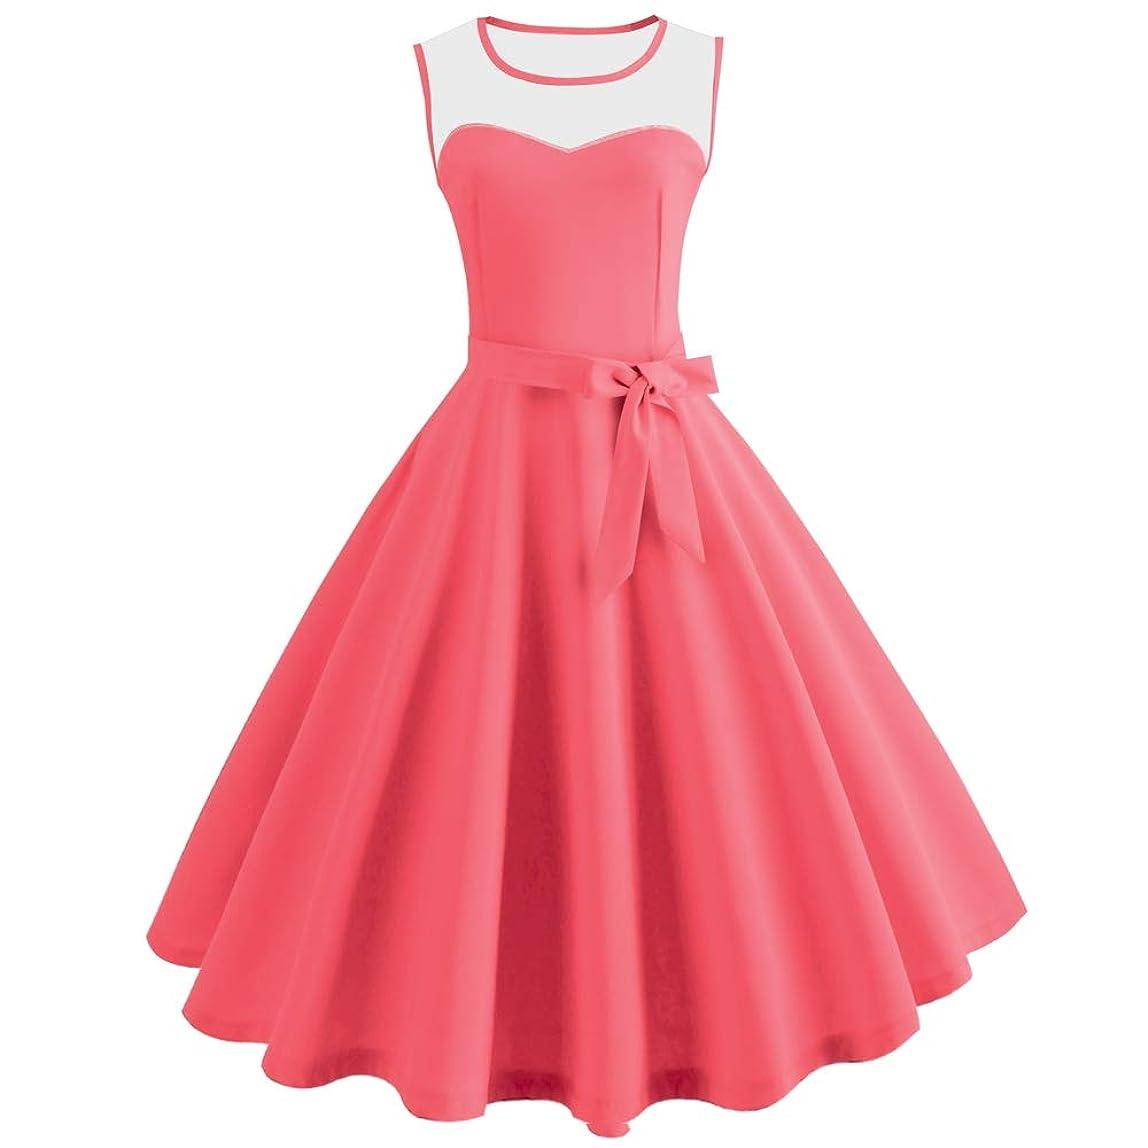 KCatsy Hepburn Vintage Series Women Dress Spring and Summer Grenadine Stitching Design Sleeveless Belt Retro Corset Dress wzowiwk145555